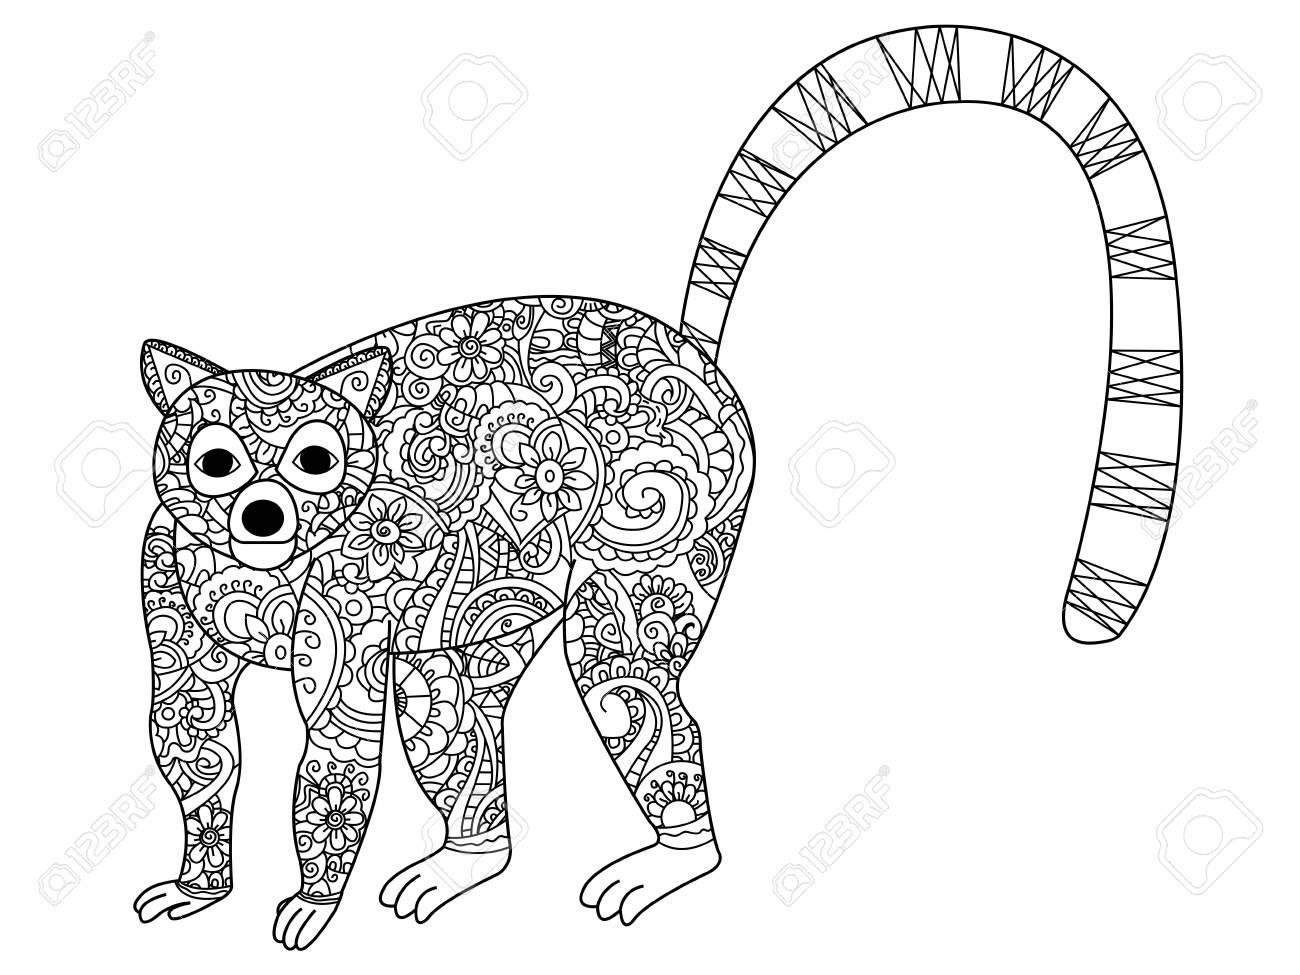 Anillo De Cola Lémur Libro Para Adultos Ilustración. Antiestrés Para ...